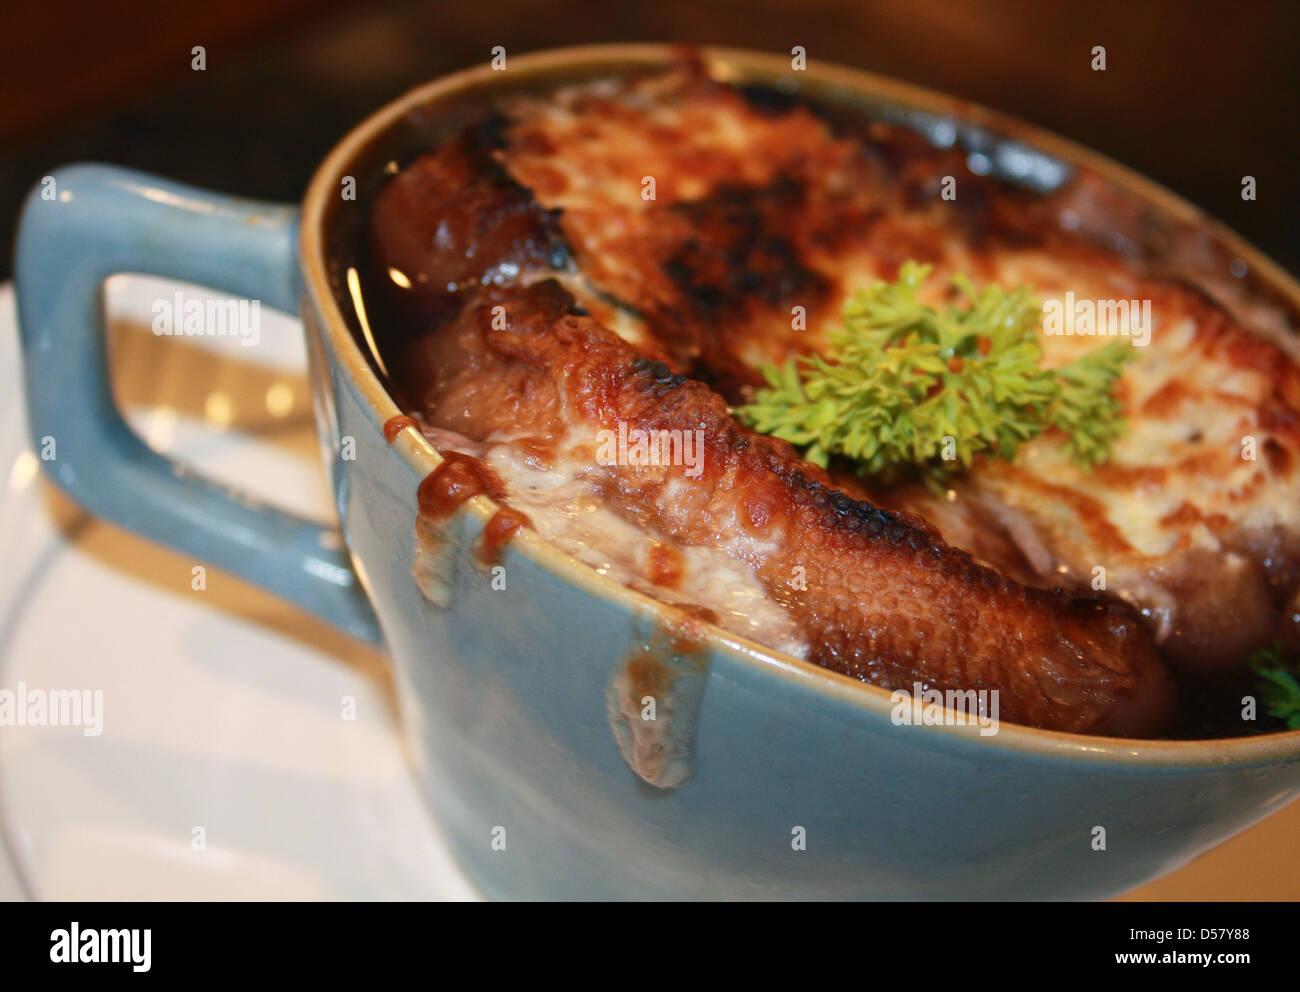 recipte stock photos recipte stock images alamy